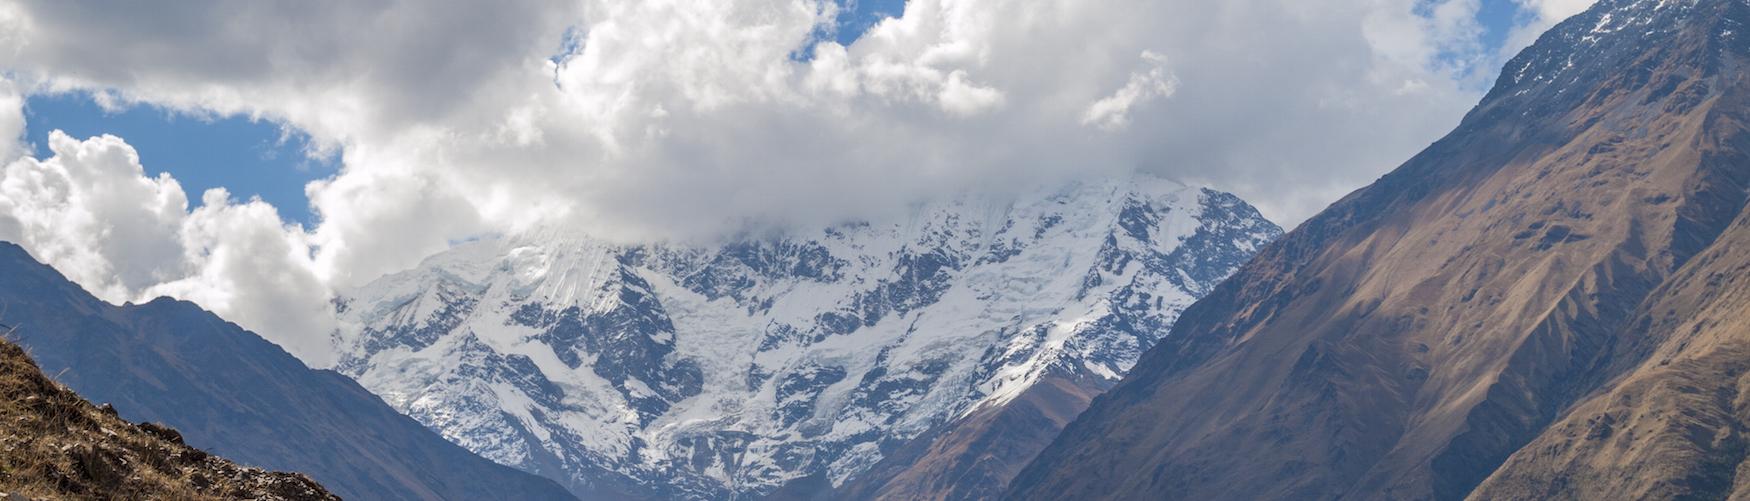 Speciaal slapen langs de Salkantay Trek in Peru